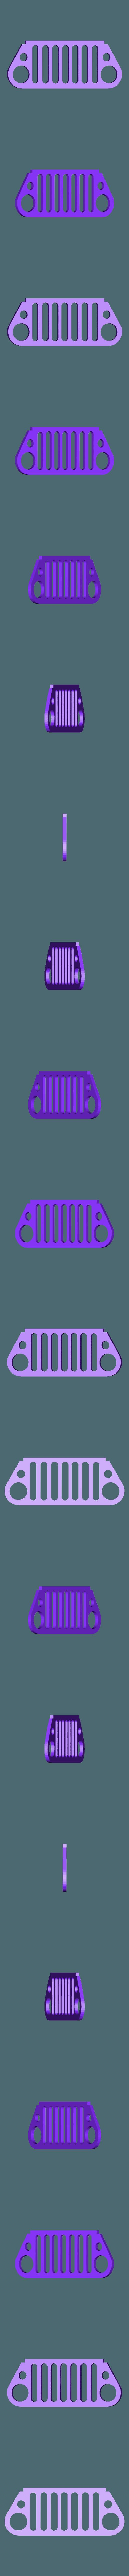 Jeep_Grill.STL Download free STL file Jeep Grill Keychain • 3D print template, Urgnarb